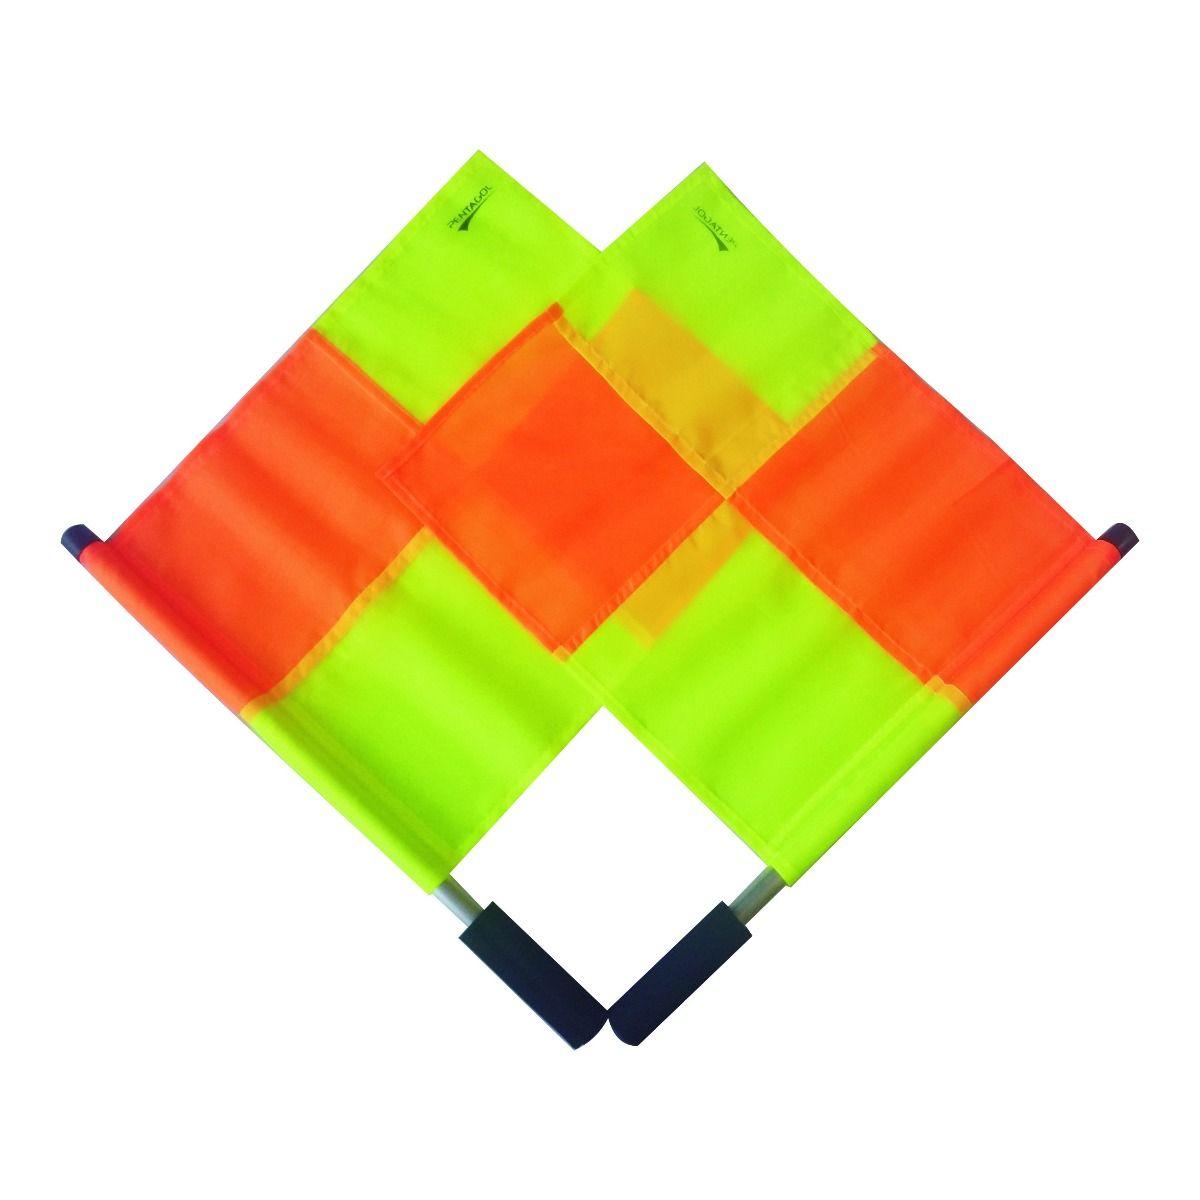 Kit Bandeira de Auxiliar Árbitro / Bandeirinha - 4 Gomos - Par - Pentagol  - Loja do Competidor